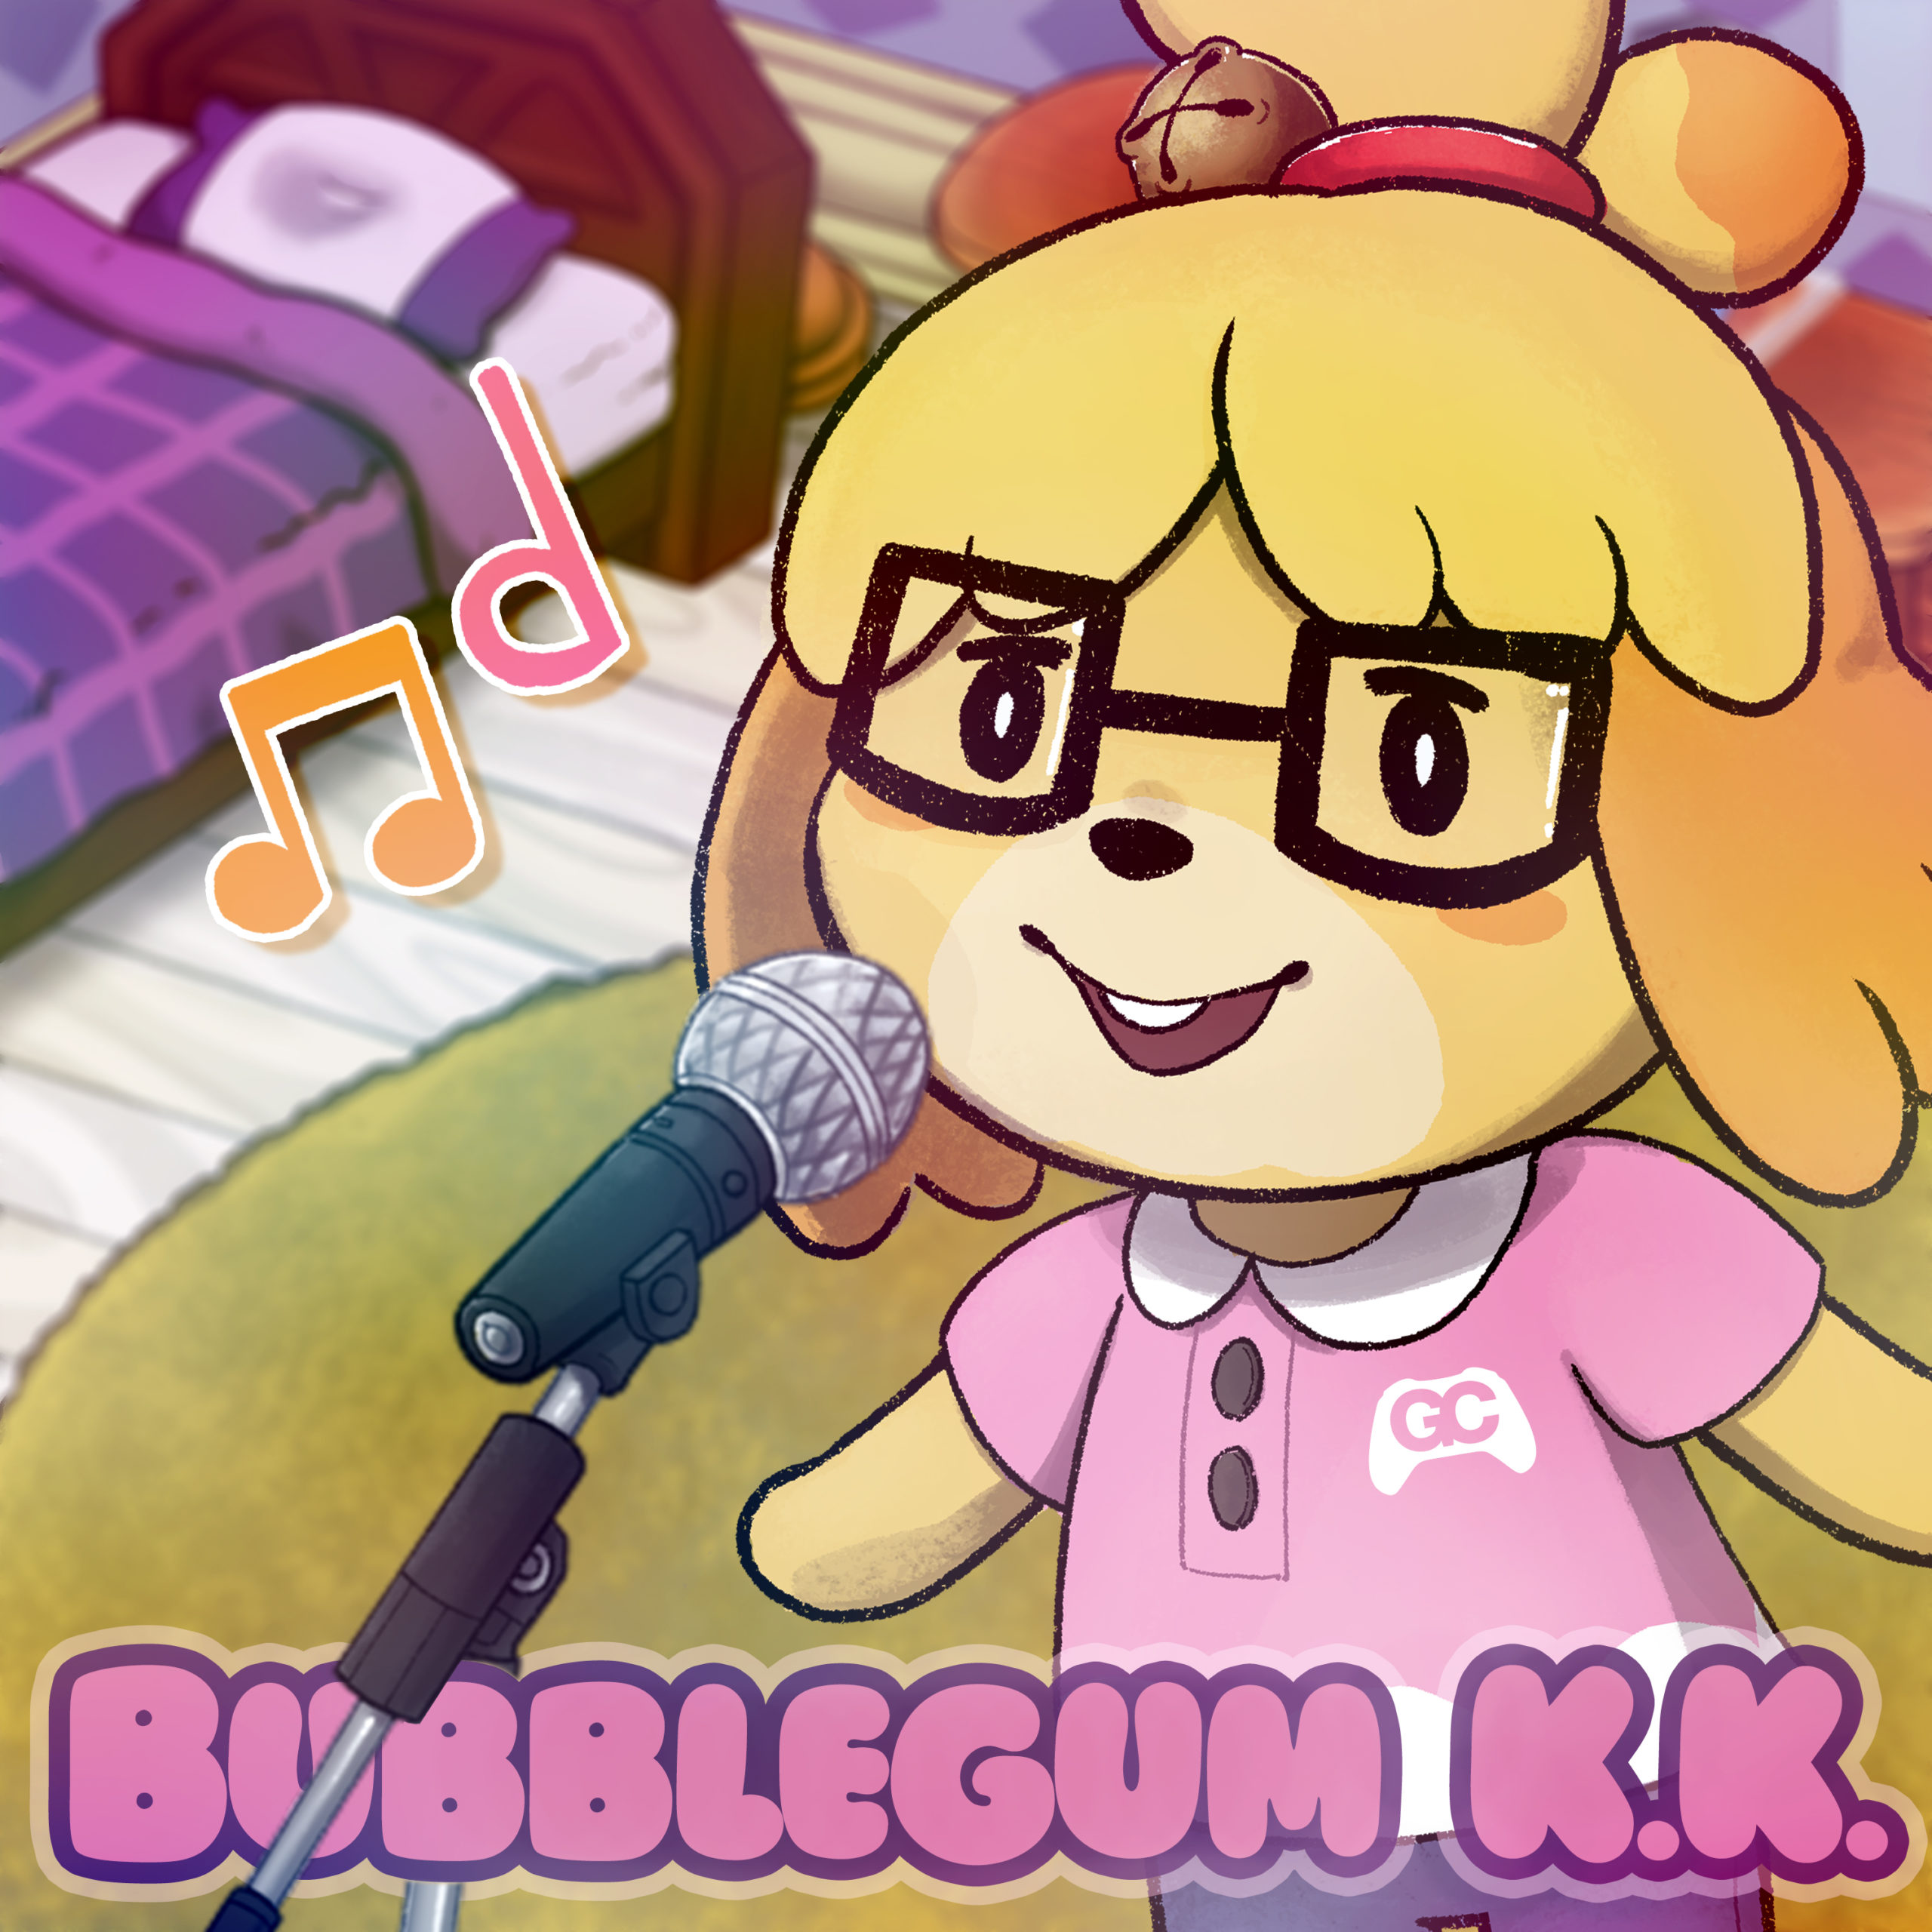 Bubblegum K.K. – The Icarus Kid